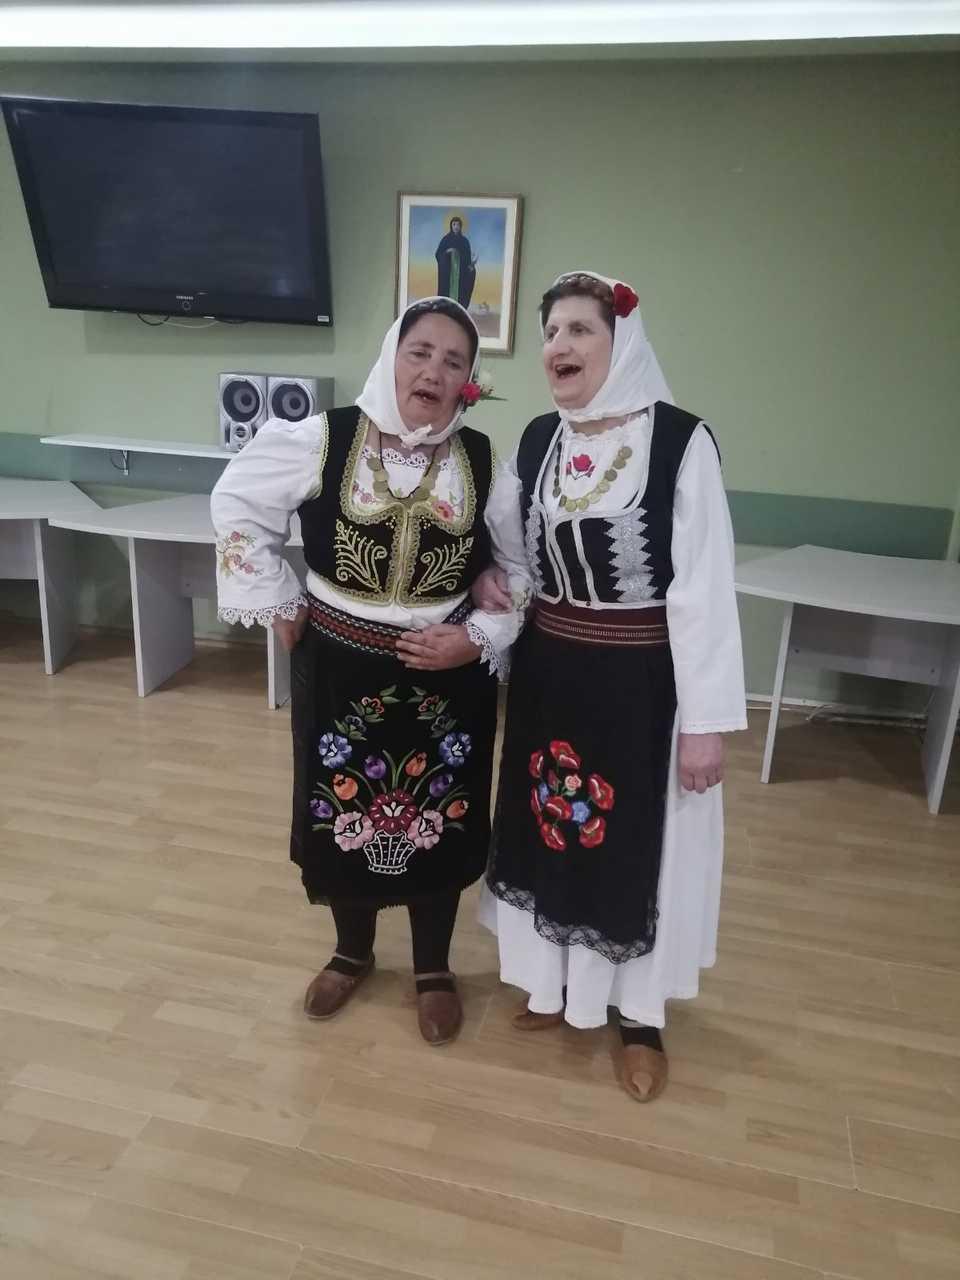 "Традиционални концерт корисника ГЦ Јагодина и клуба пензионера ""Здравац"" 2"